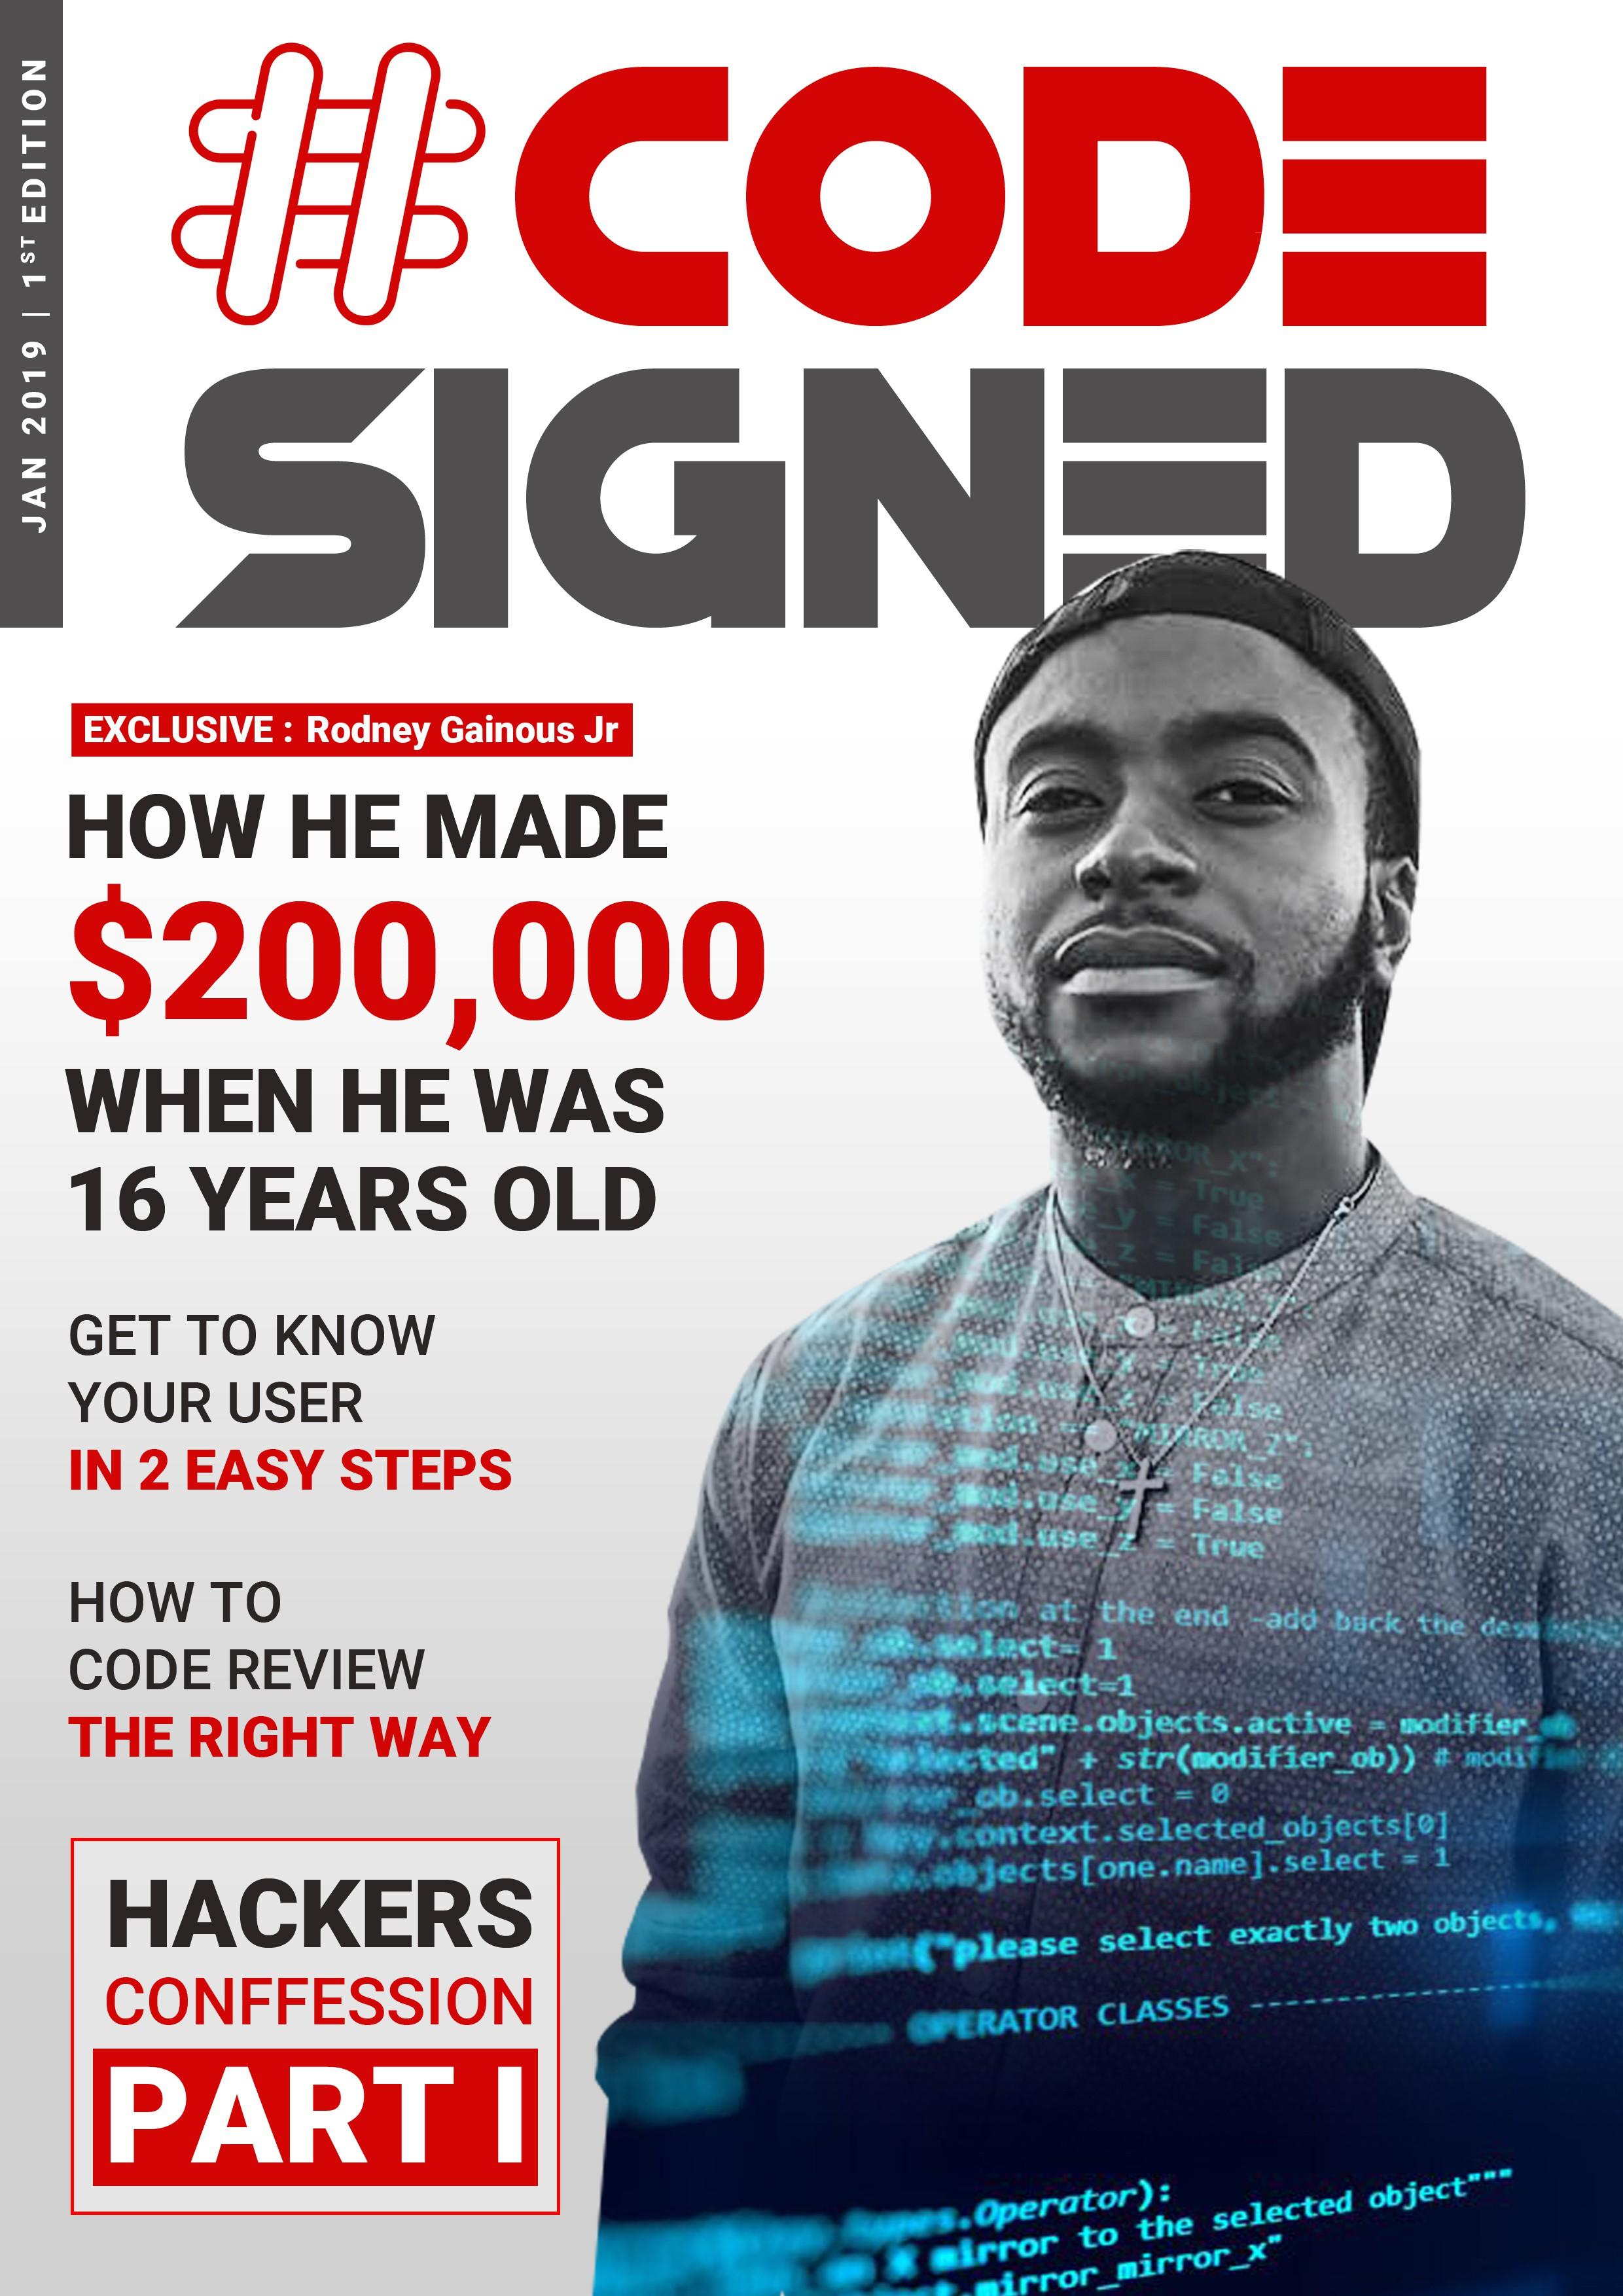 Design a #CodeSigned Magazine Cover for Millenials